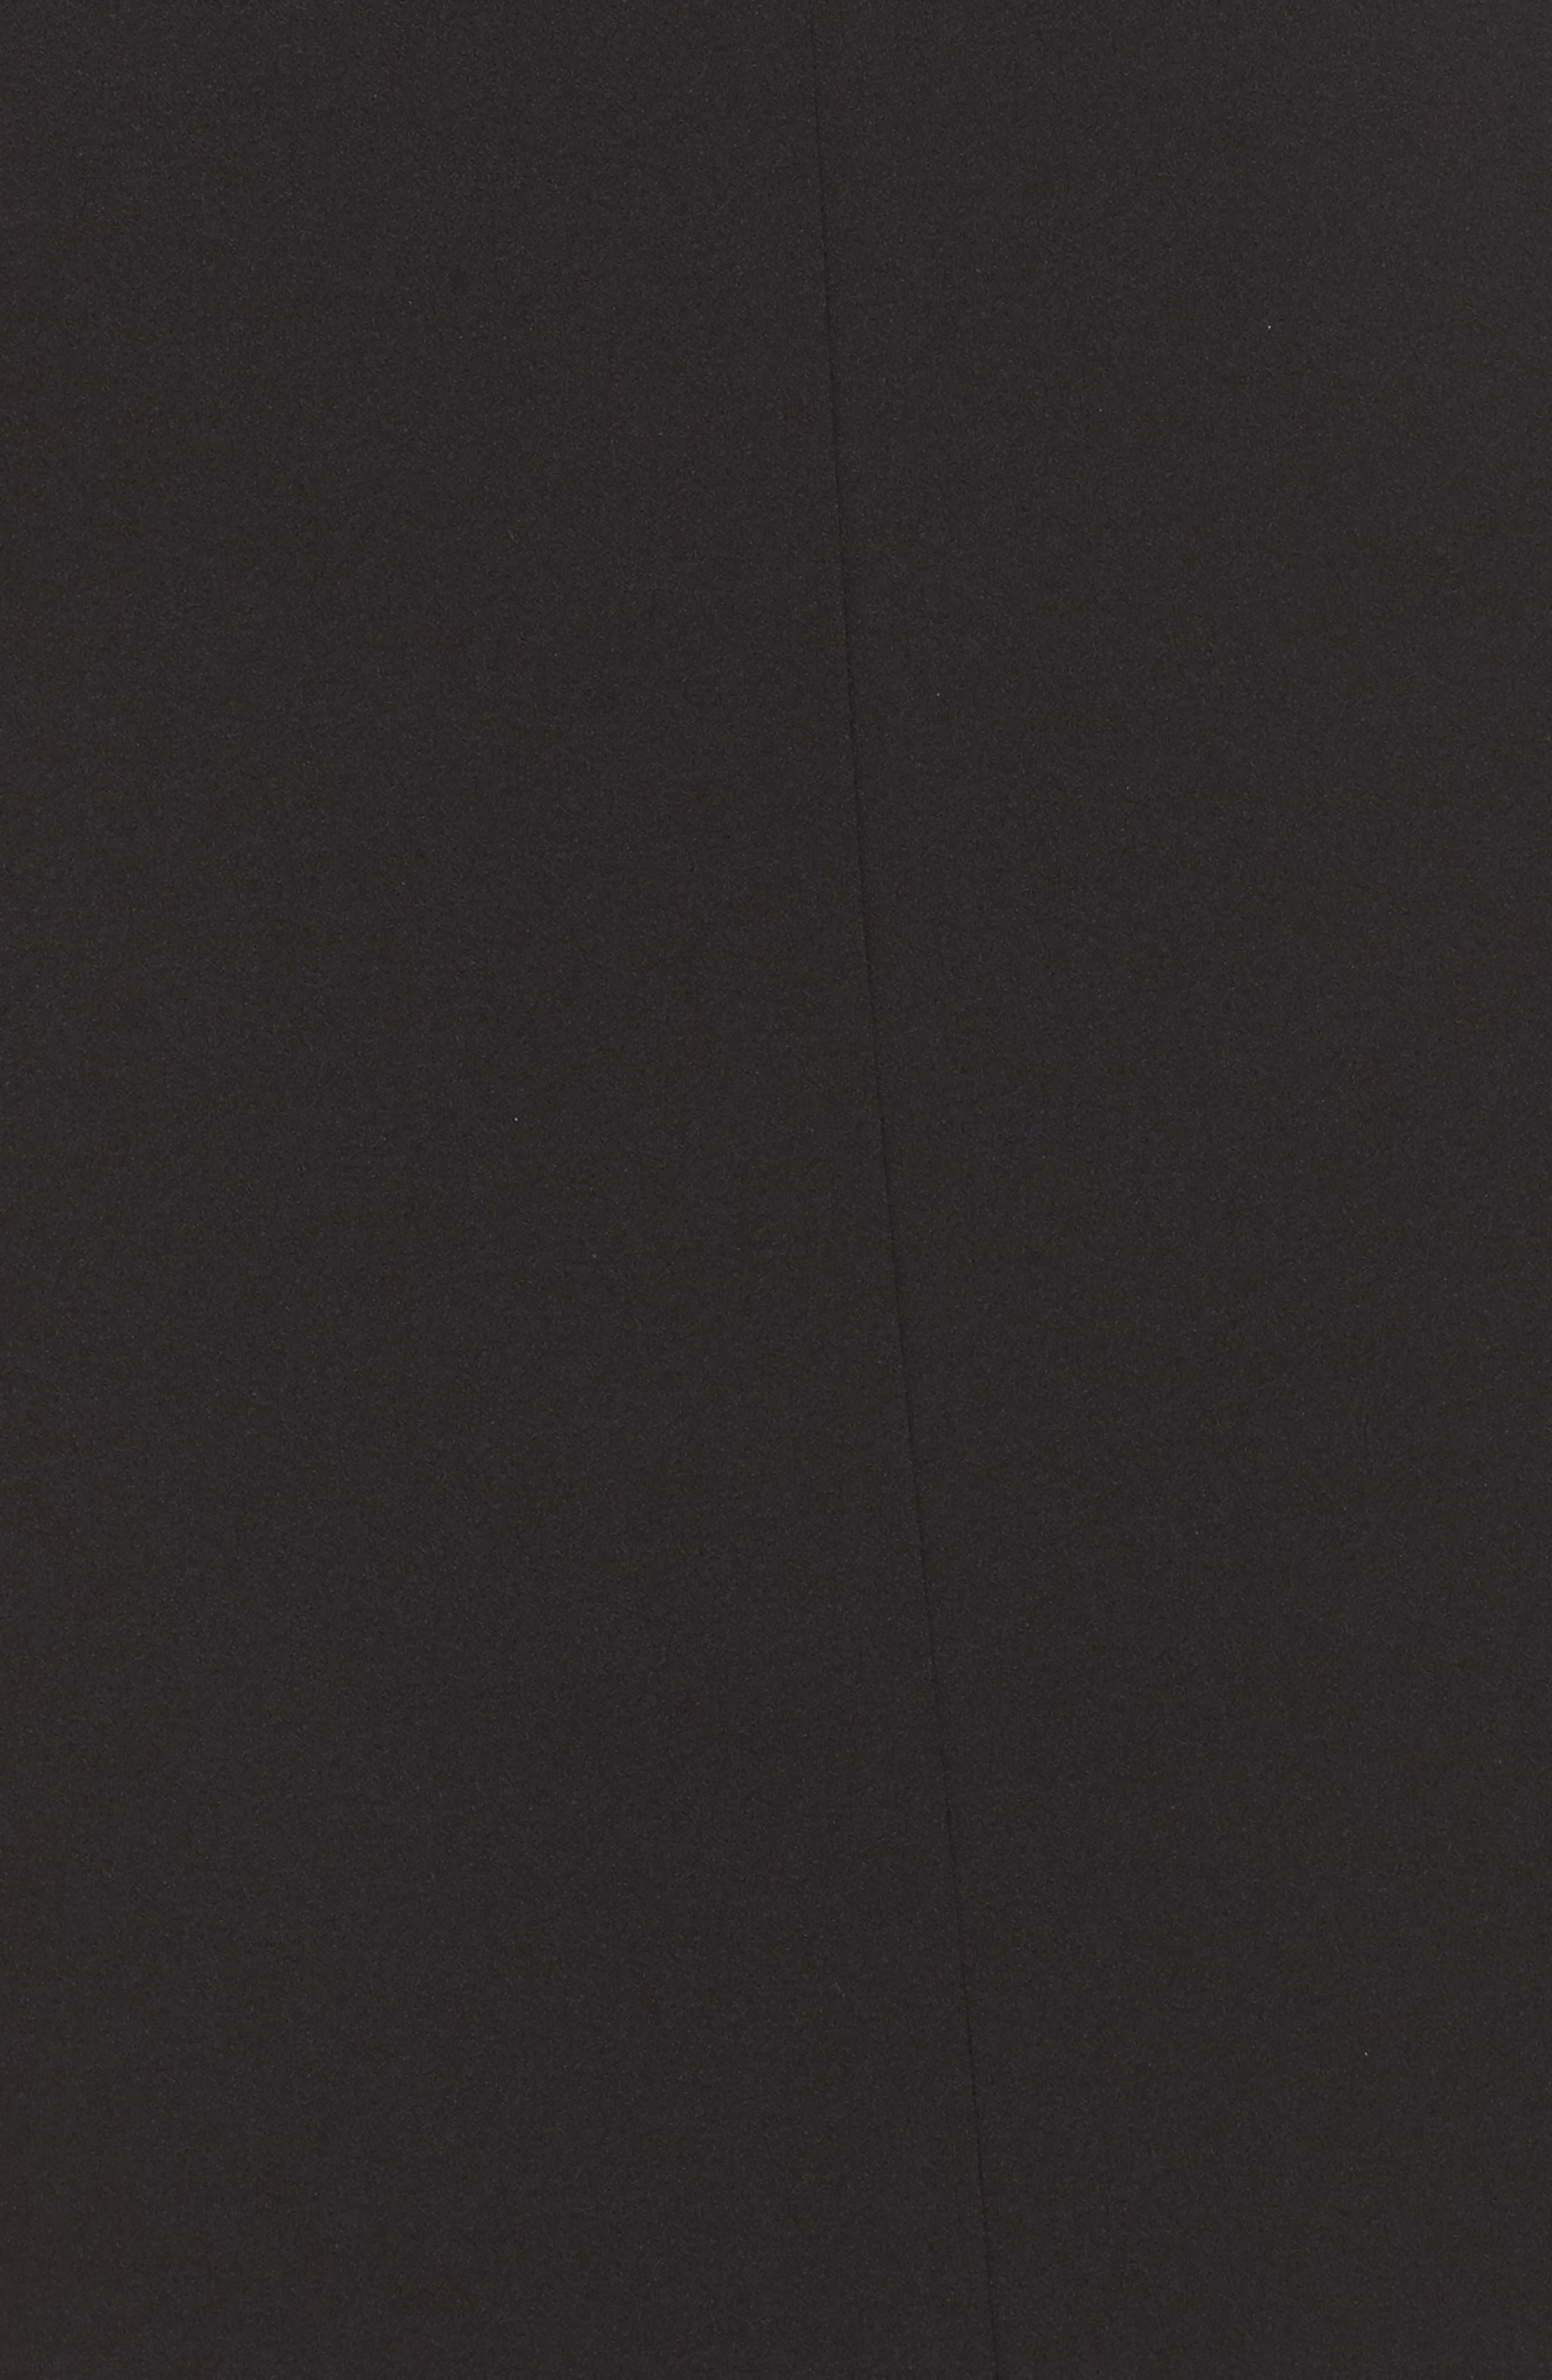 Stretch Crepe Sheath Dress,                             Alternate thumbnail 5, color,                             Black/ Ivory